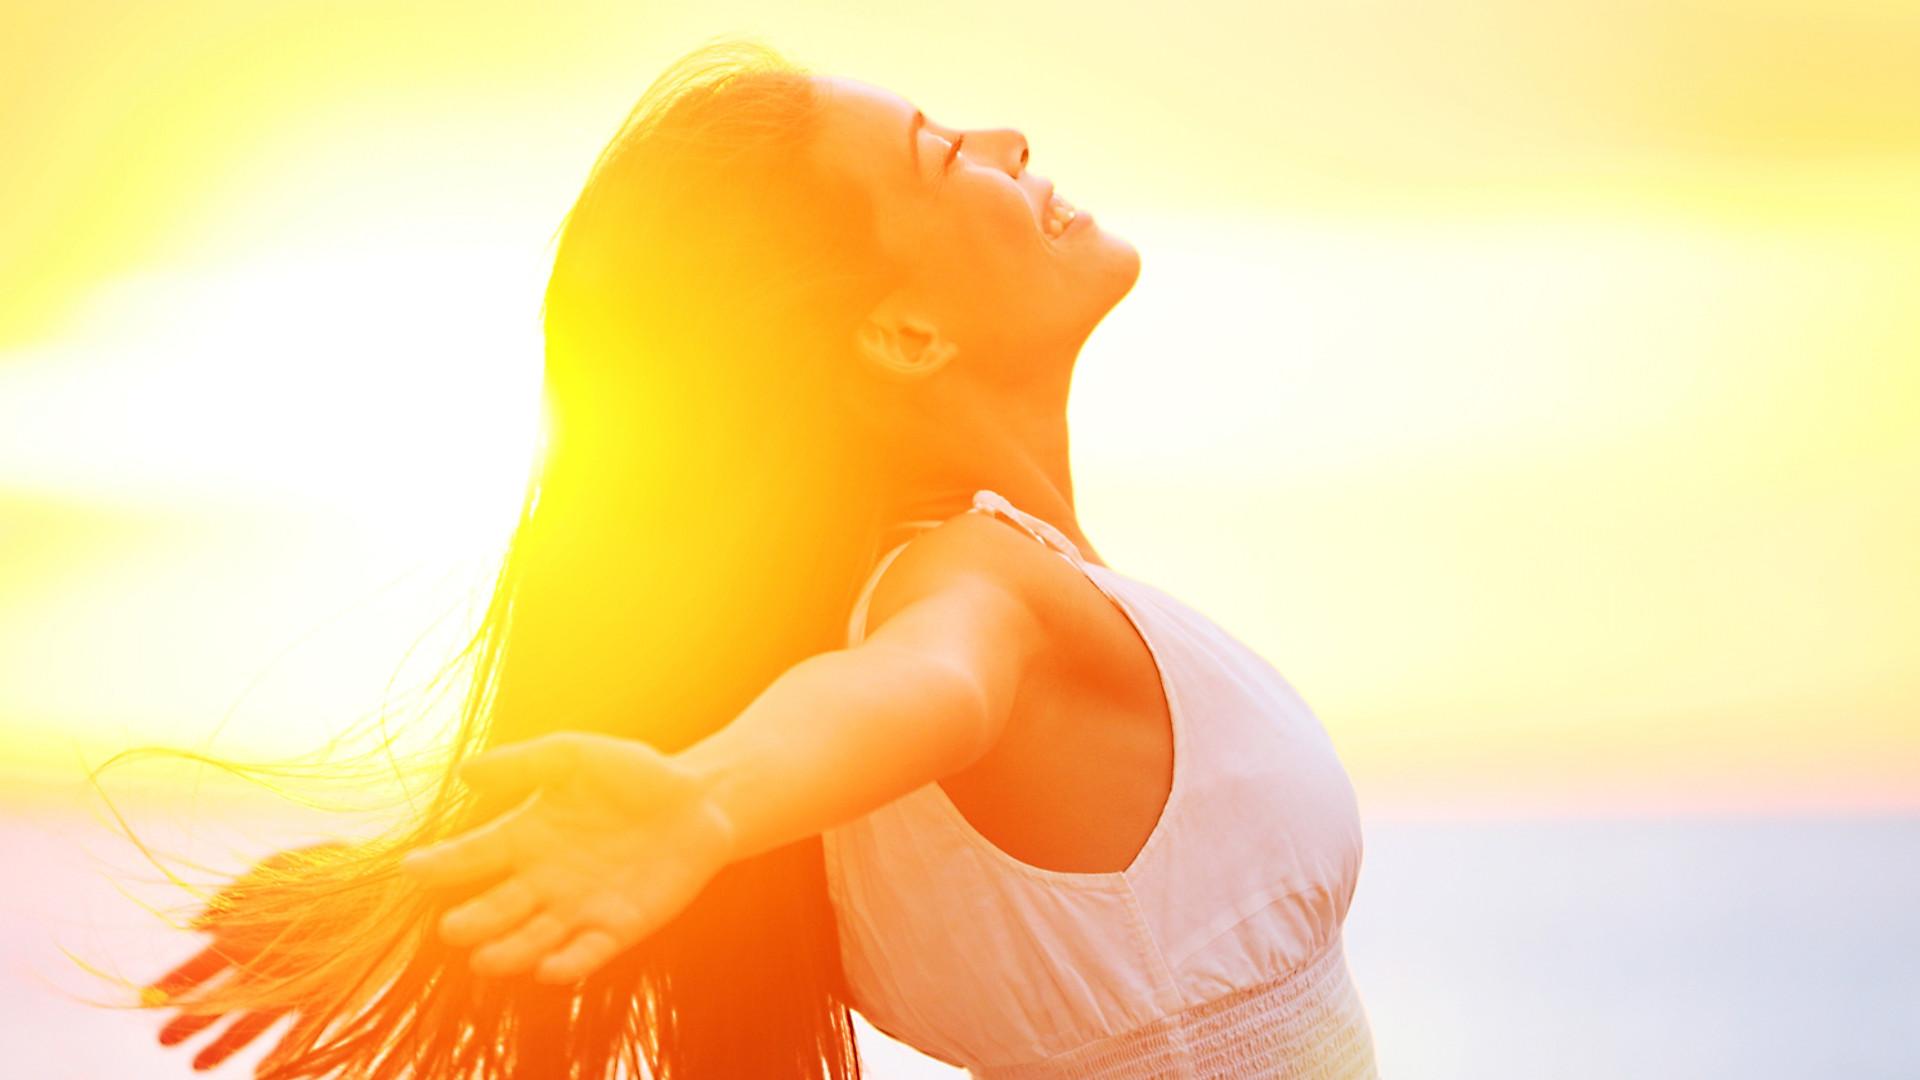 Let Sun Be Our Medicine